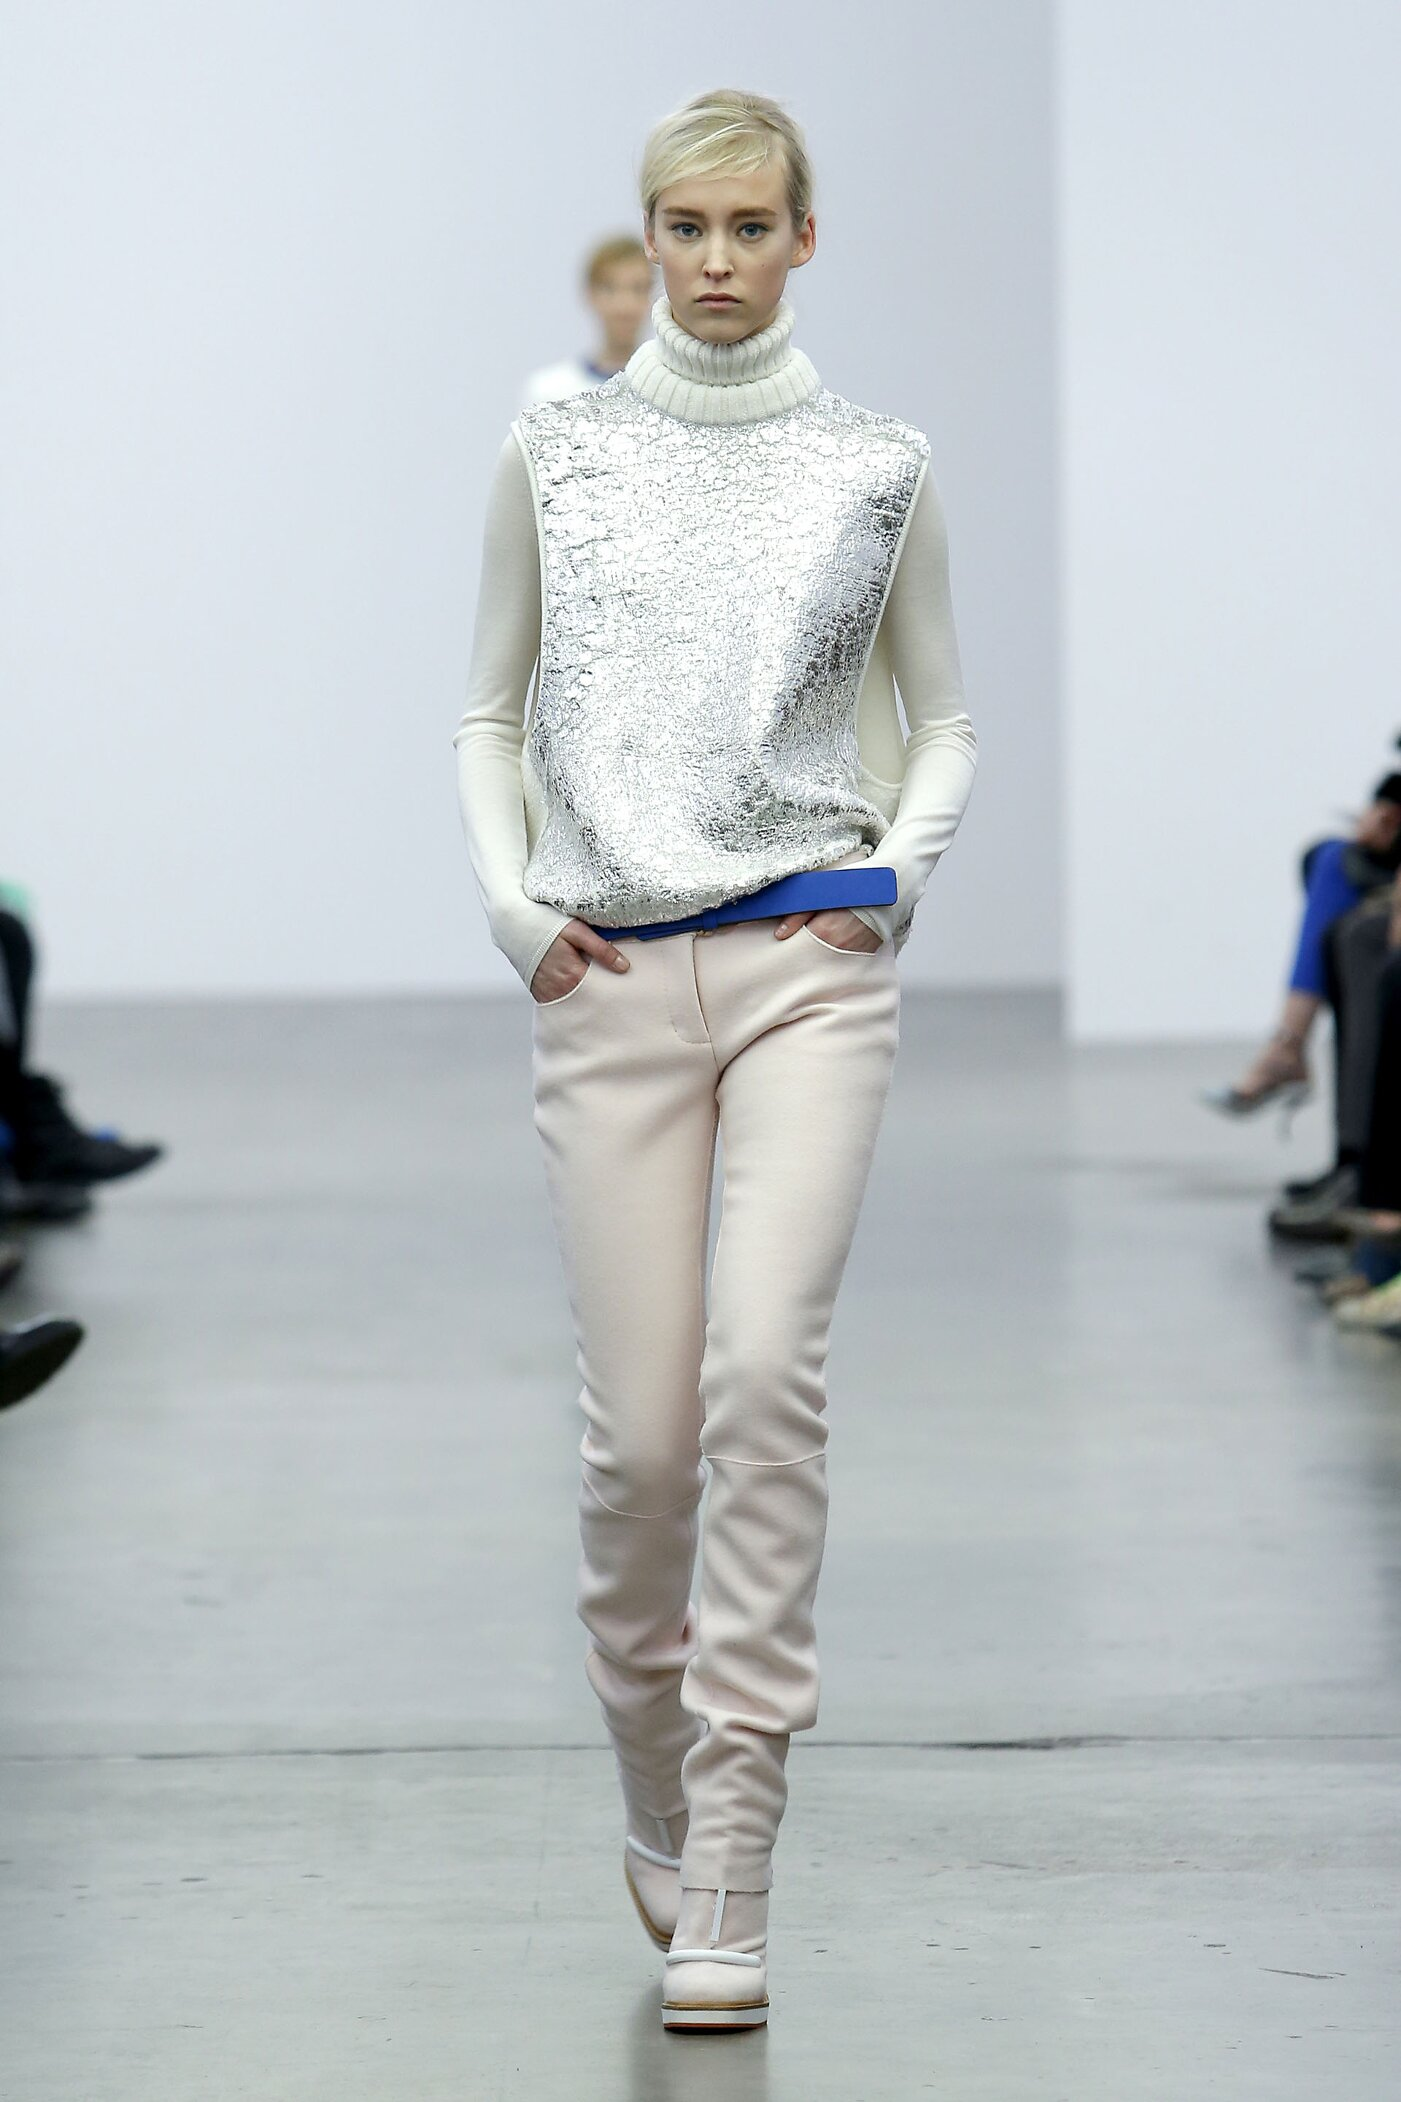 Winter Fashion Trends 2014 2015 Iceberg